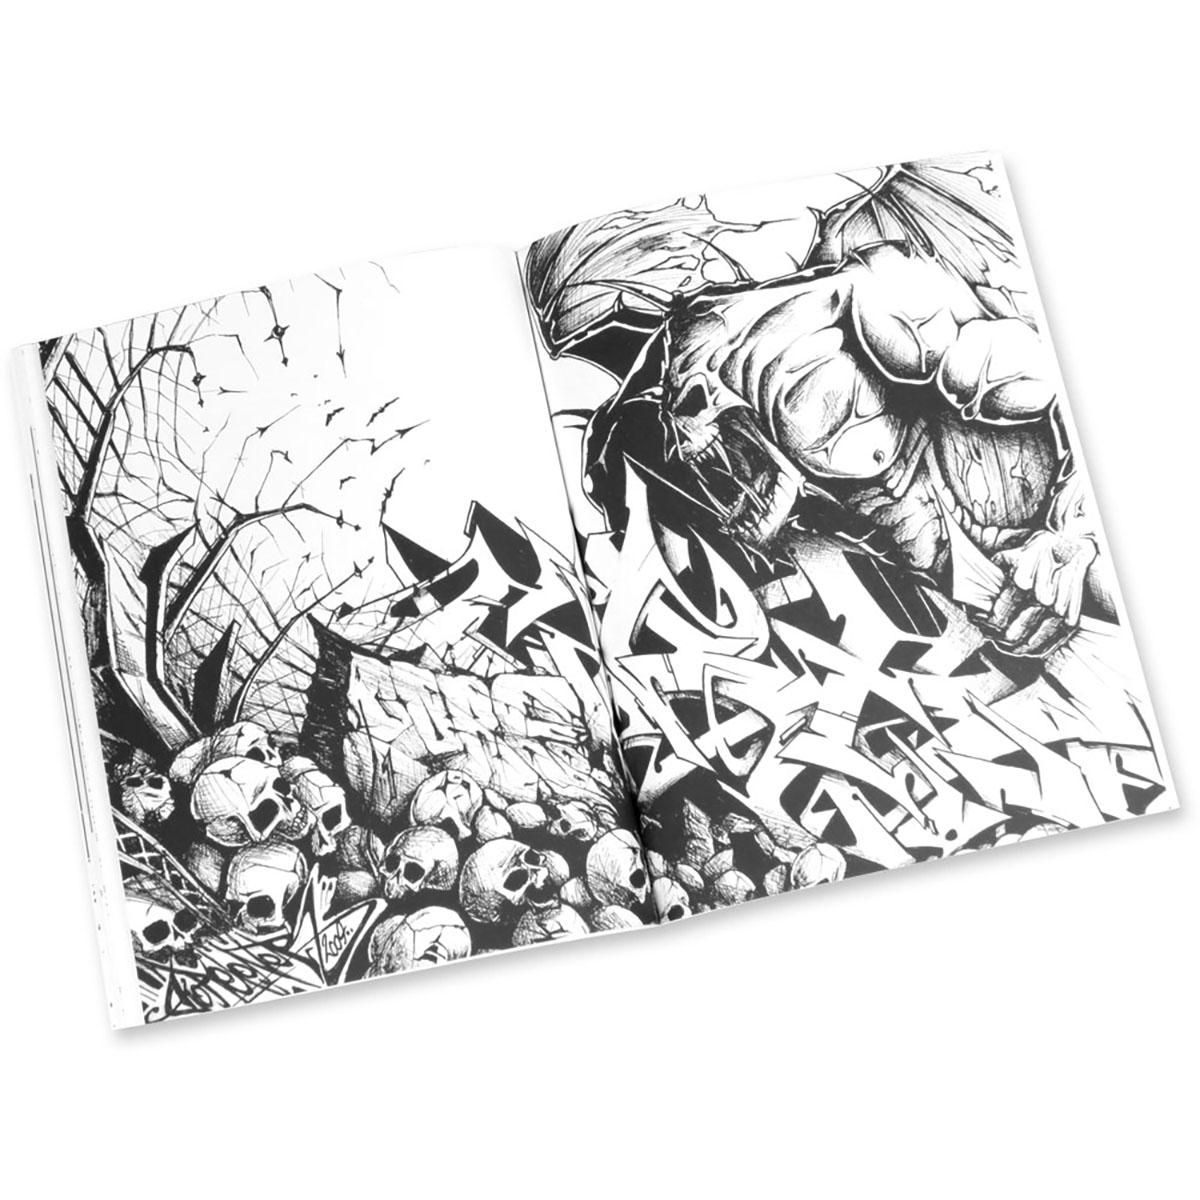 Graffiti Coloring Book 2 Characters